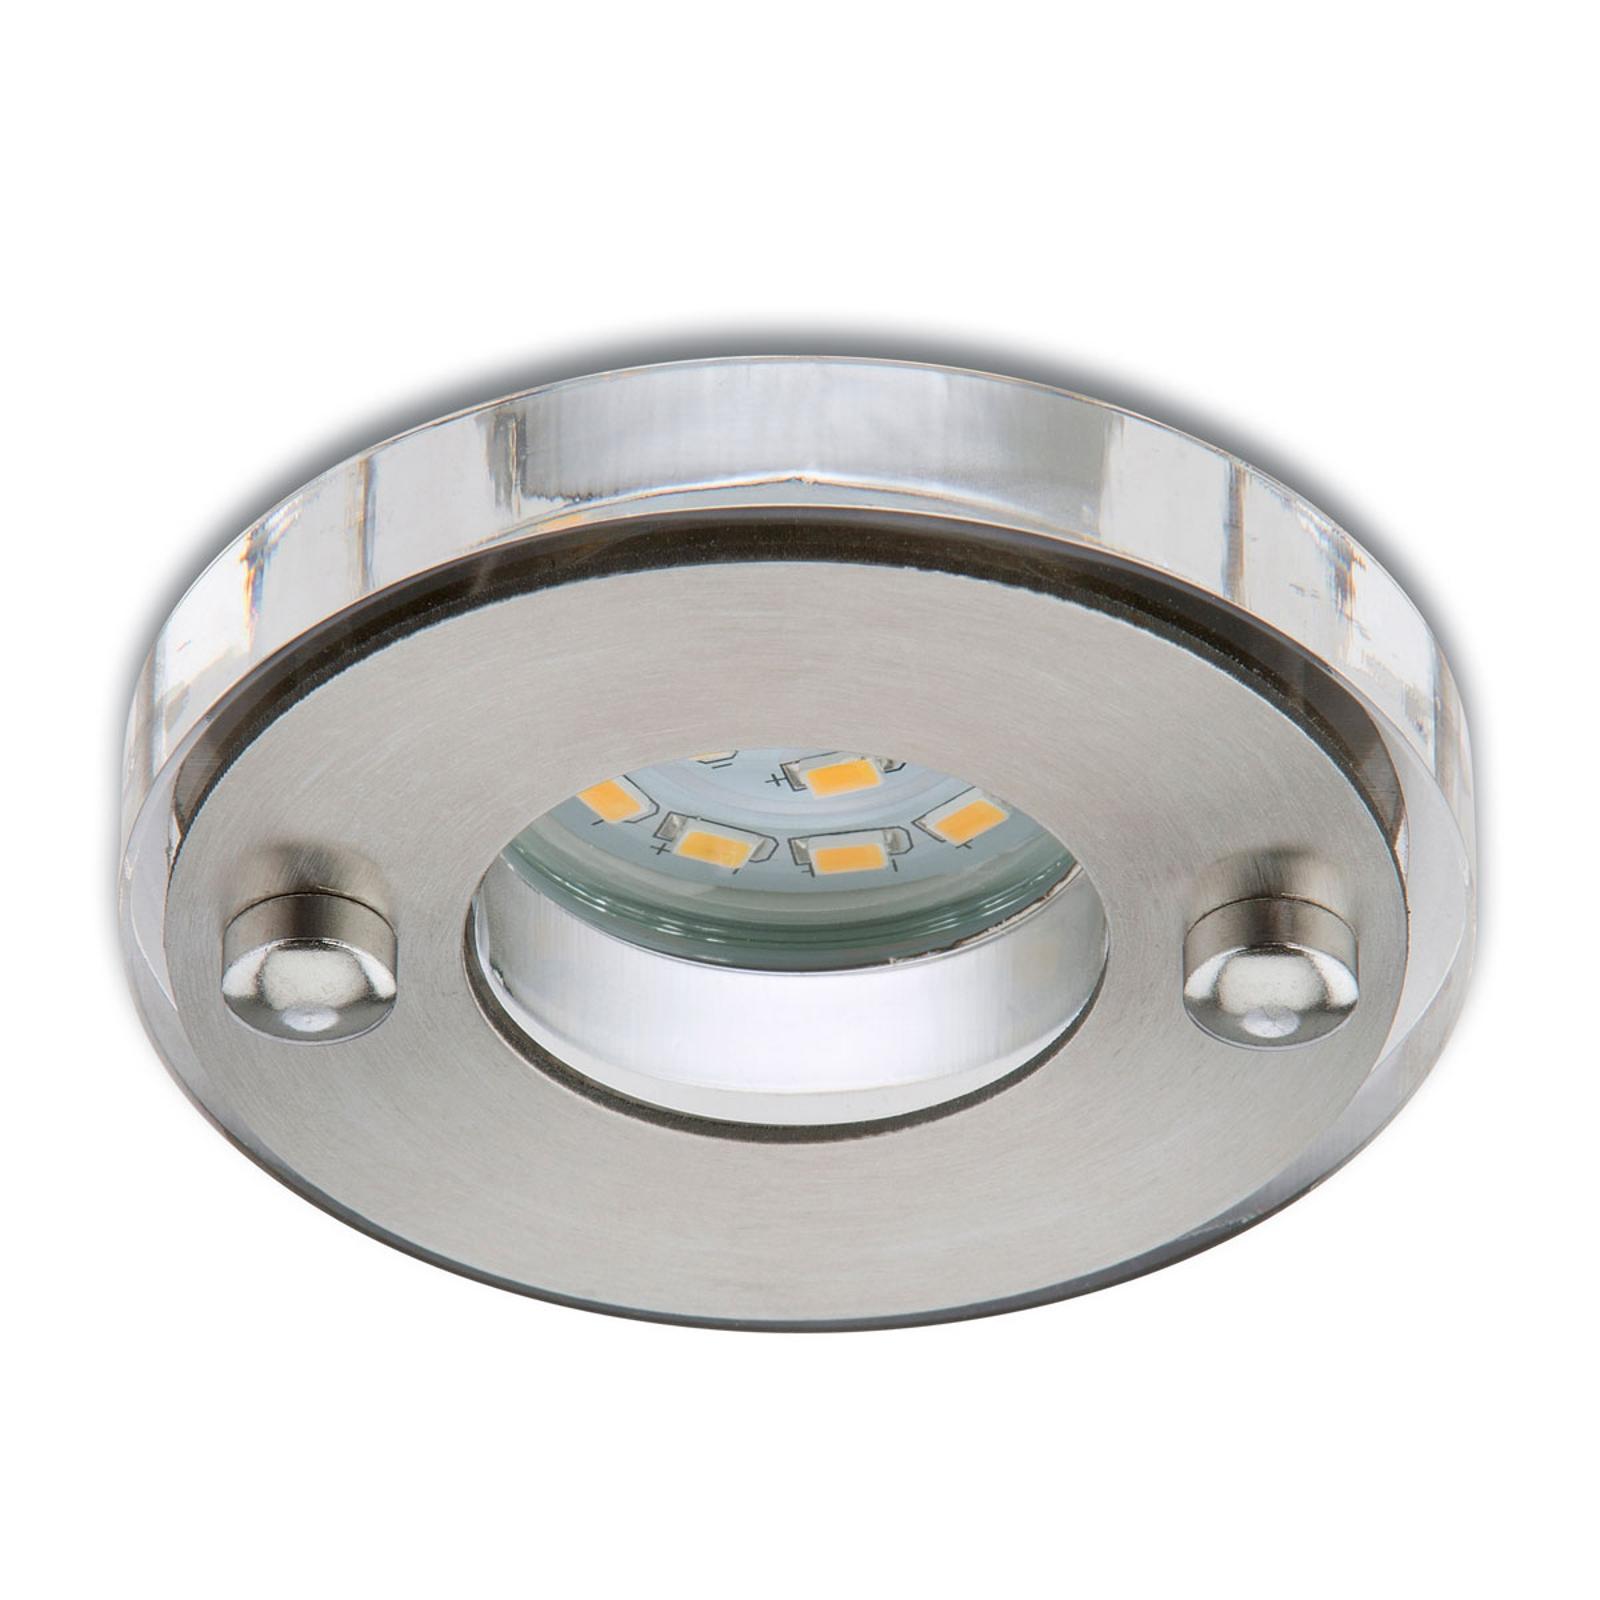 Nikas LED-indbygningsspot IP23, mat nikkel